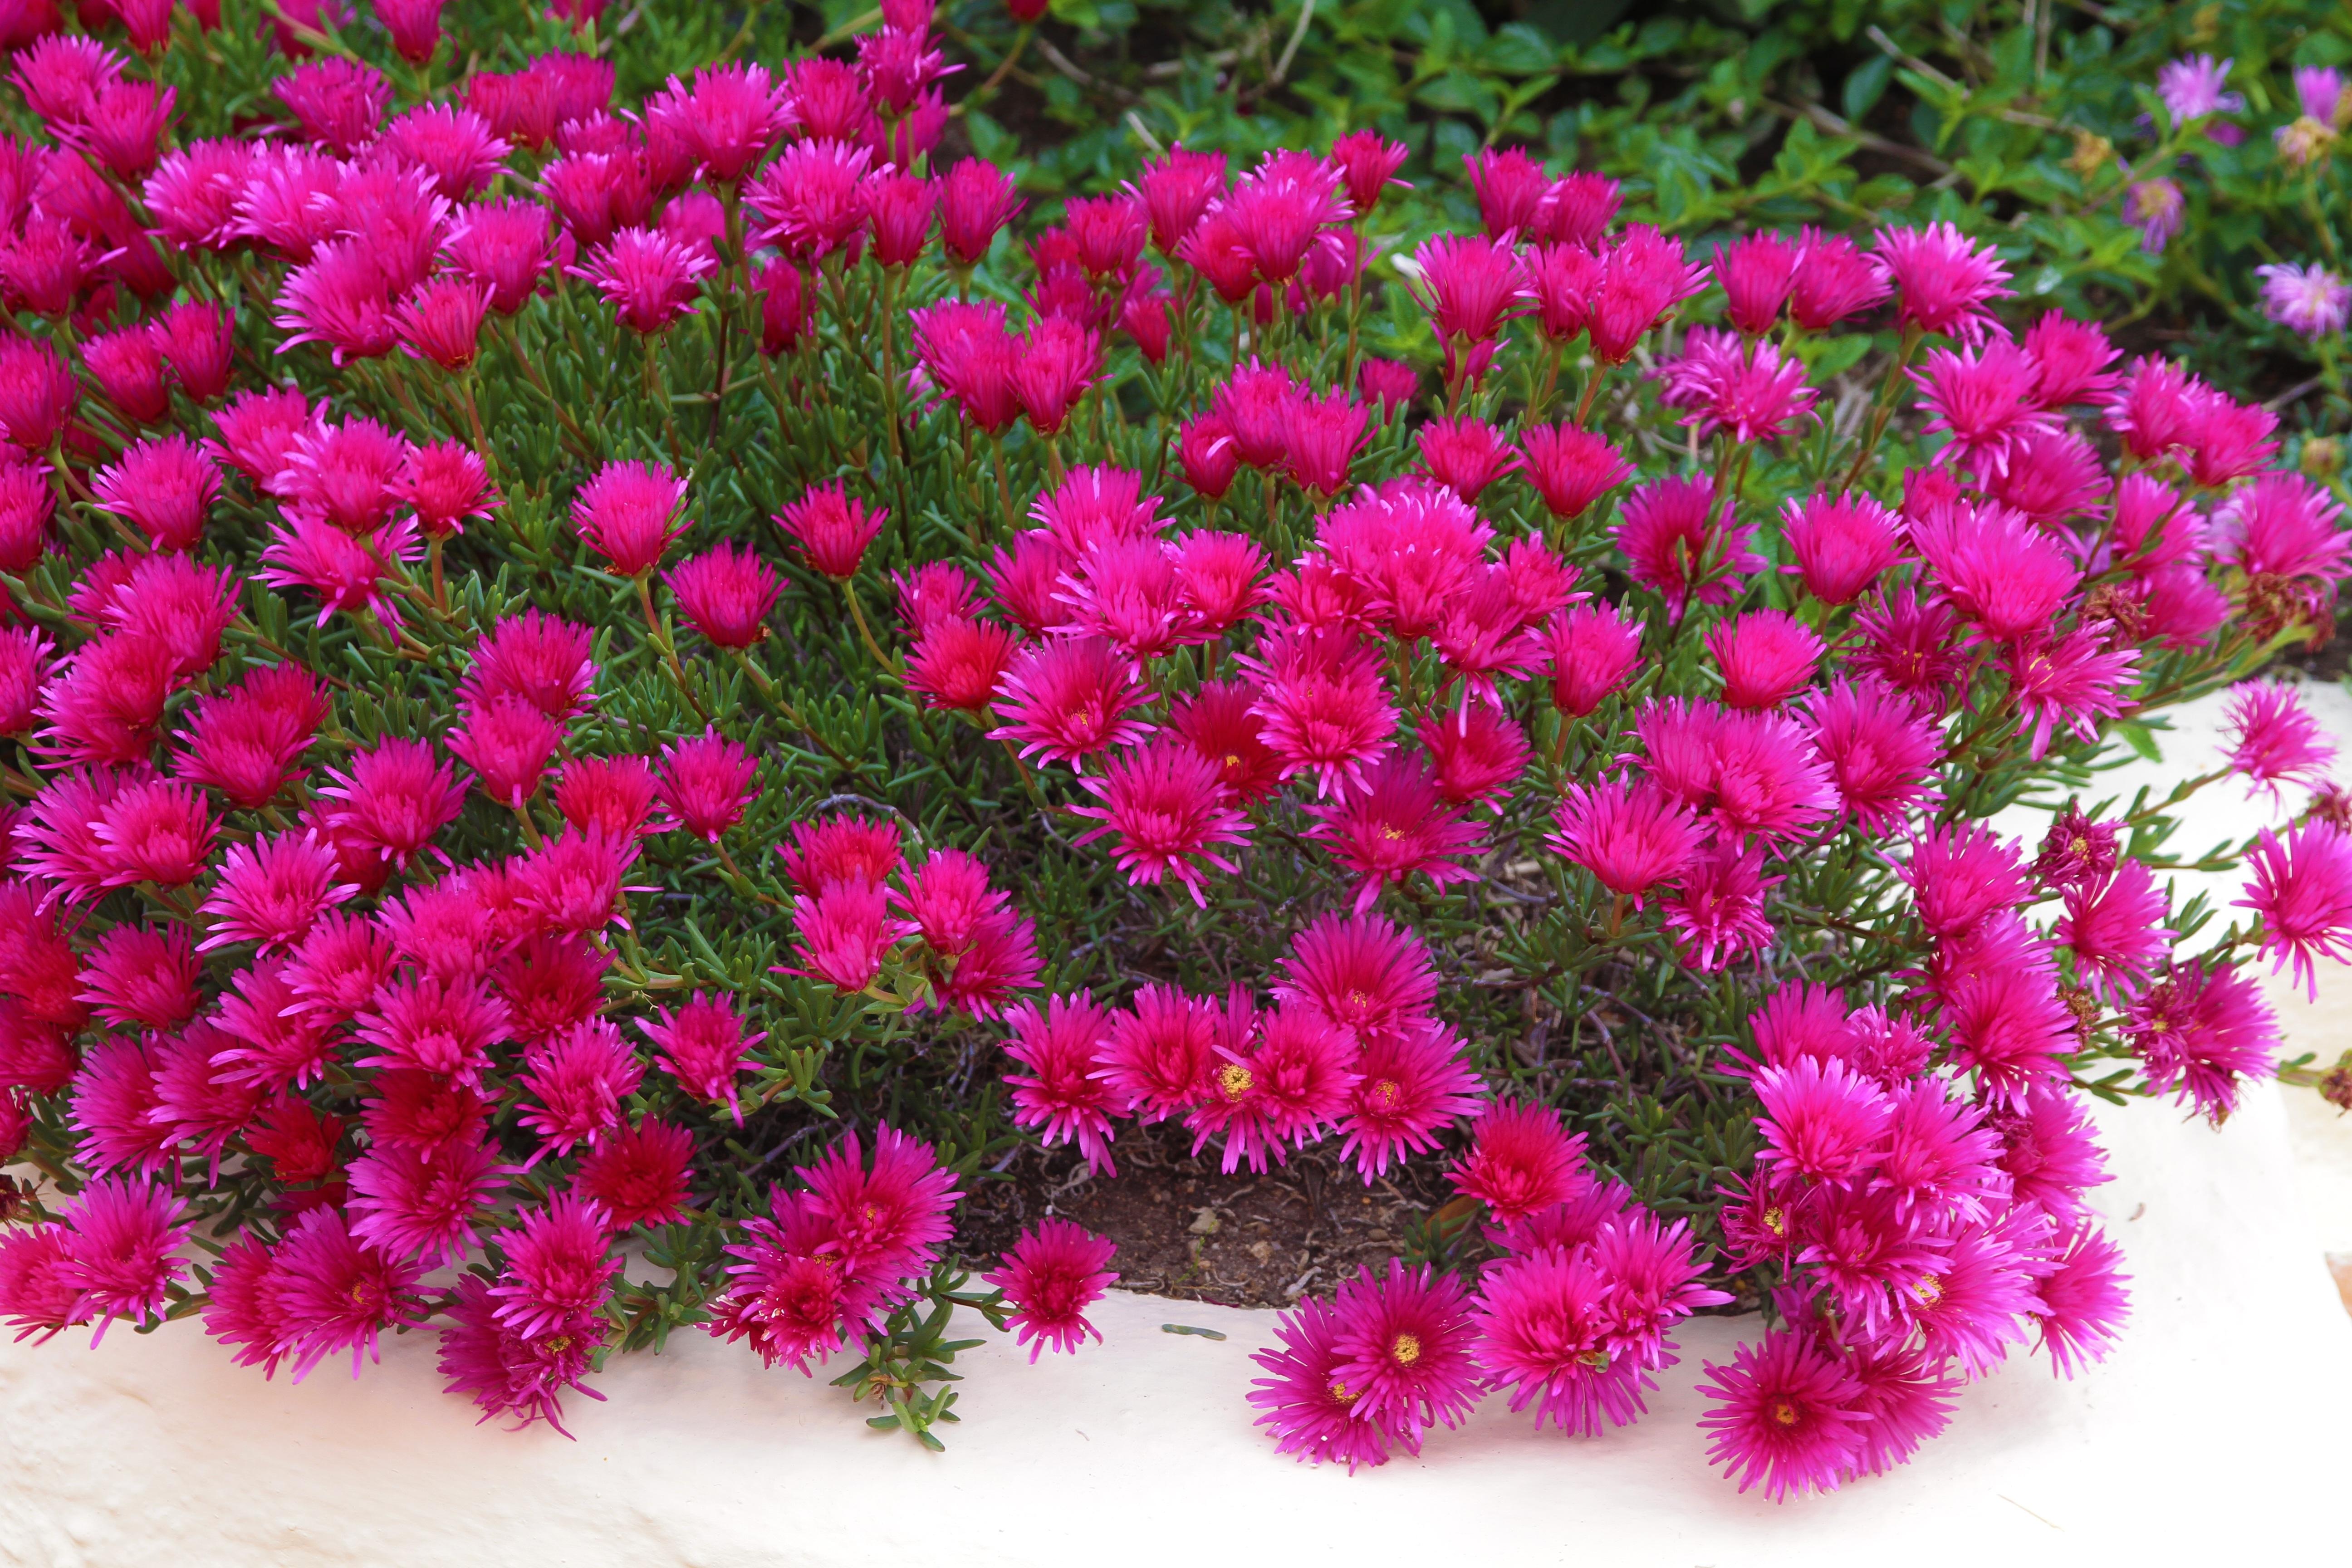 free images nature petal spring red italy close flora bed shrub carnation blossoms. Black Bedroom Furniture Sets. Home Design Ideas